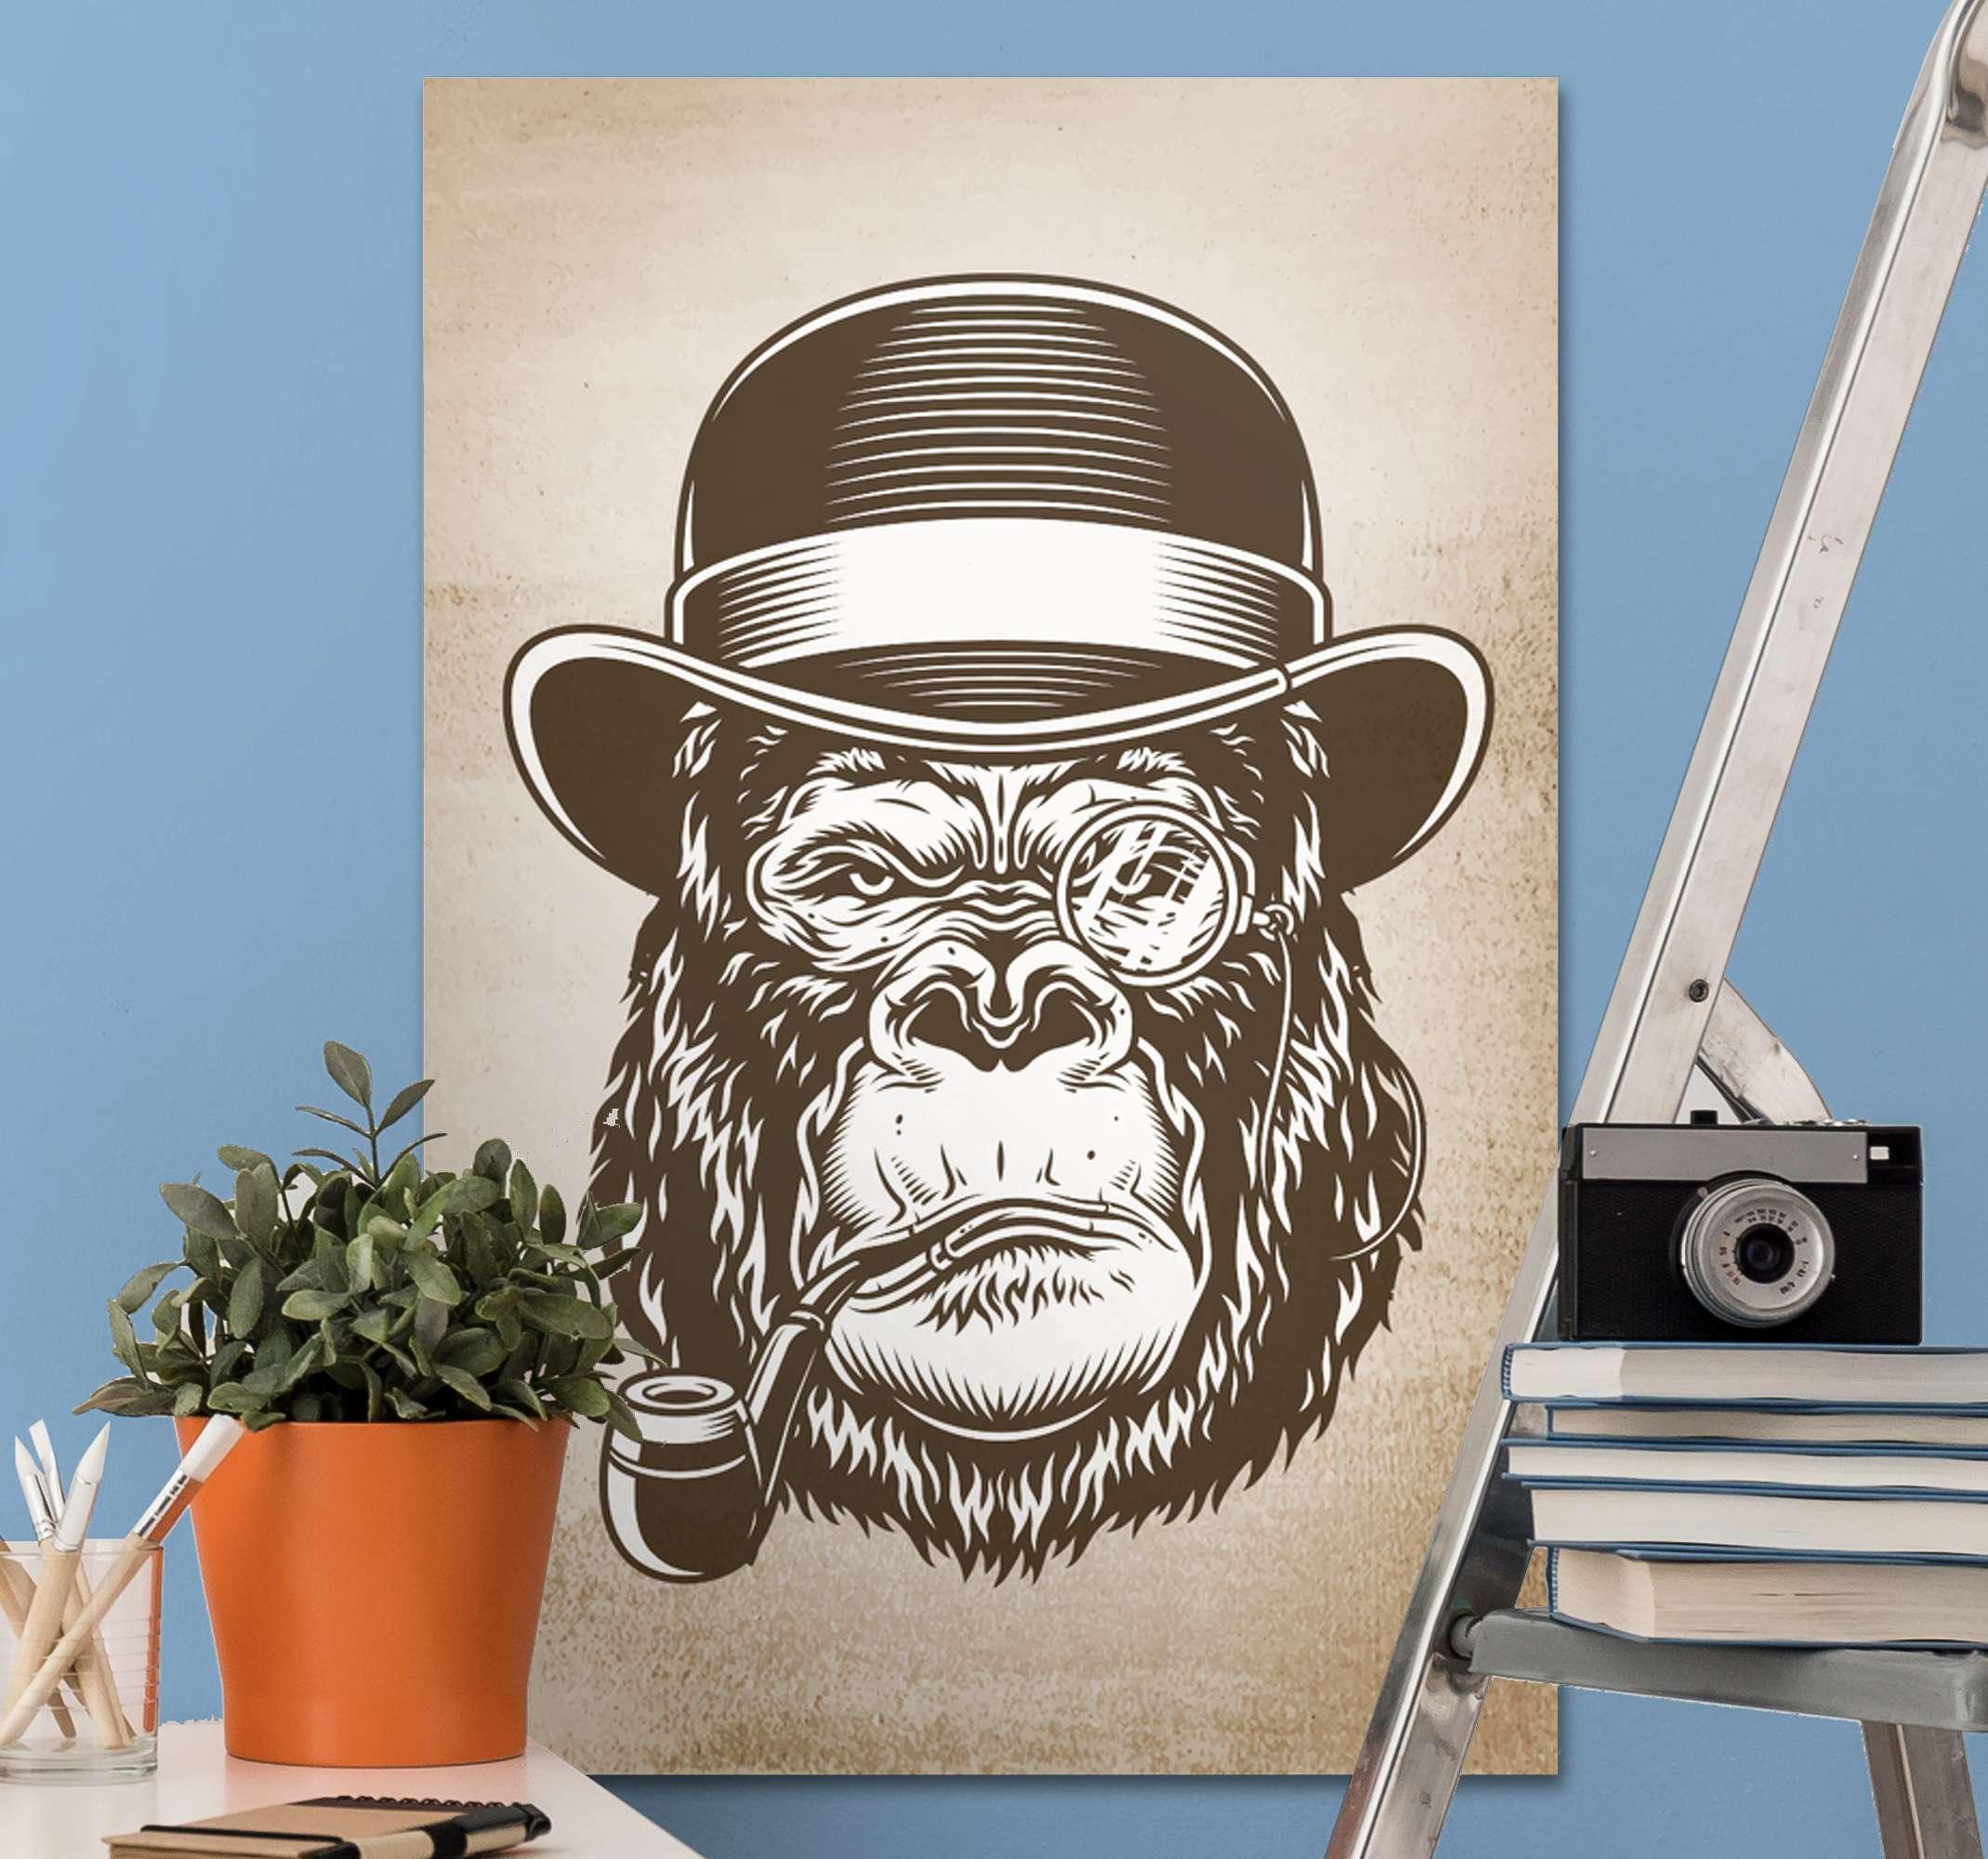 TenStickers. 猴子在画布上吸烟现代艺术版画. 猴子为您的家吸烟现代帆布墙艺术。我们的高品质家用帆布印花可为您的空间增添艺术气息。